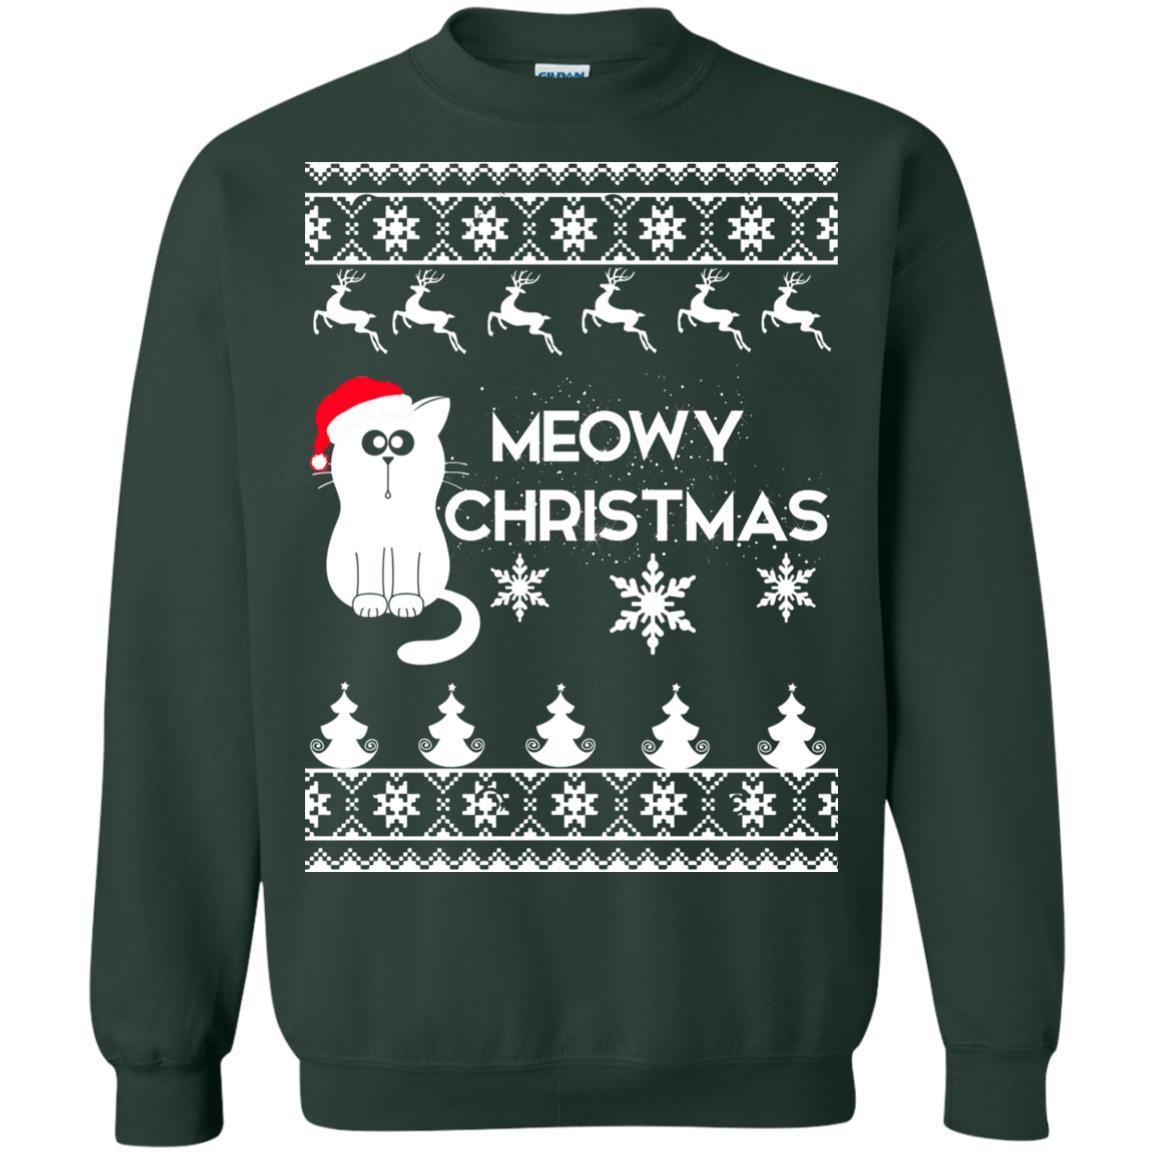 image 1777 - Meowy Christmas Sweater, Ugly Meowy Sweatshirts